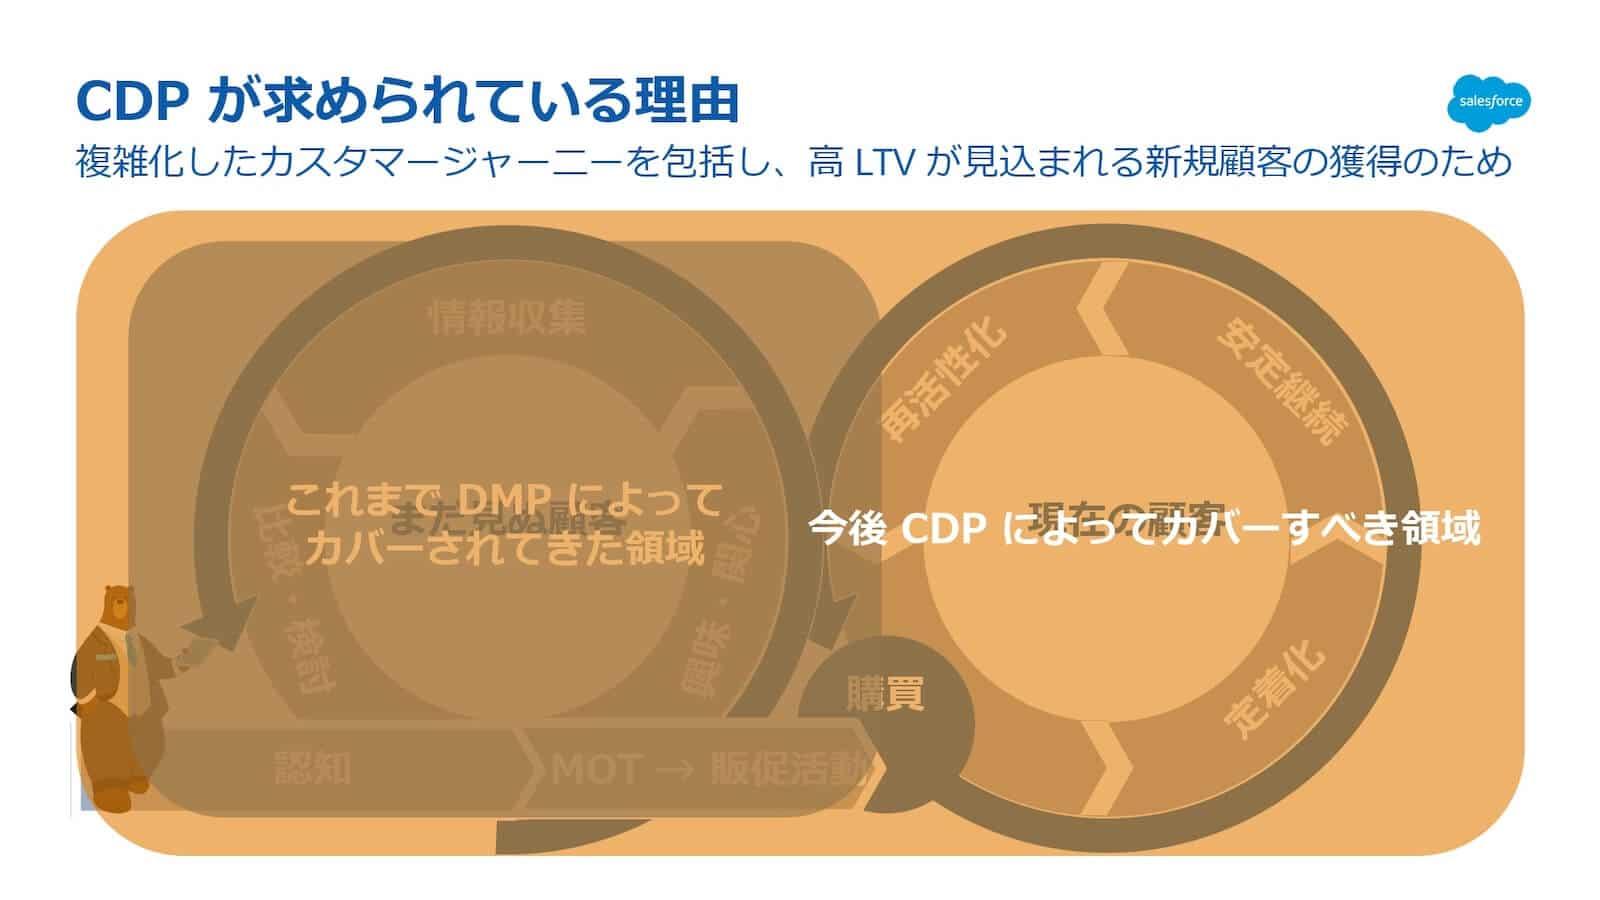 CDPが求められている理由